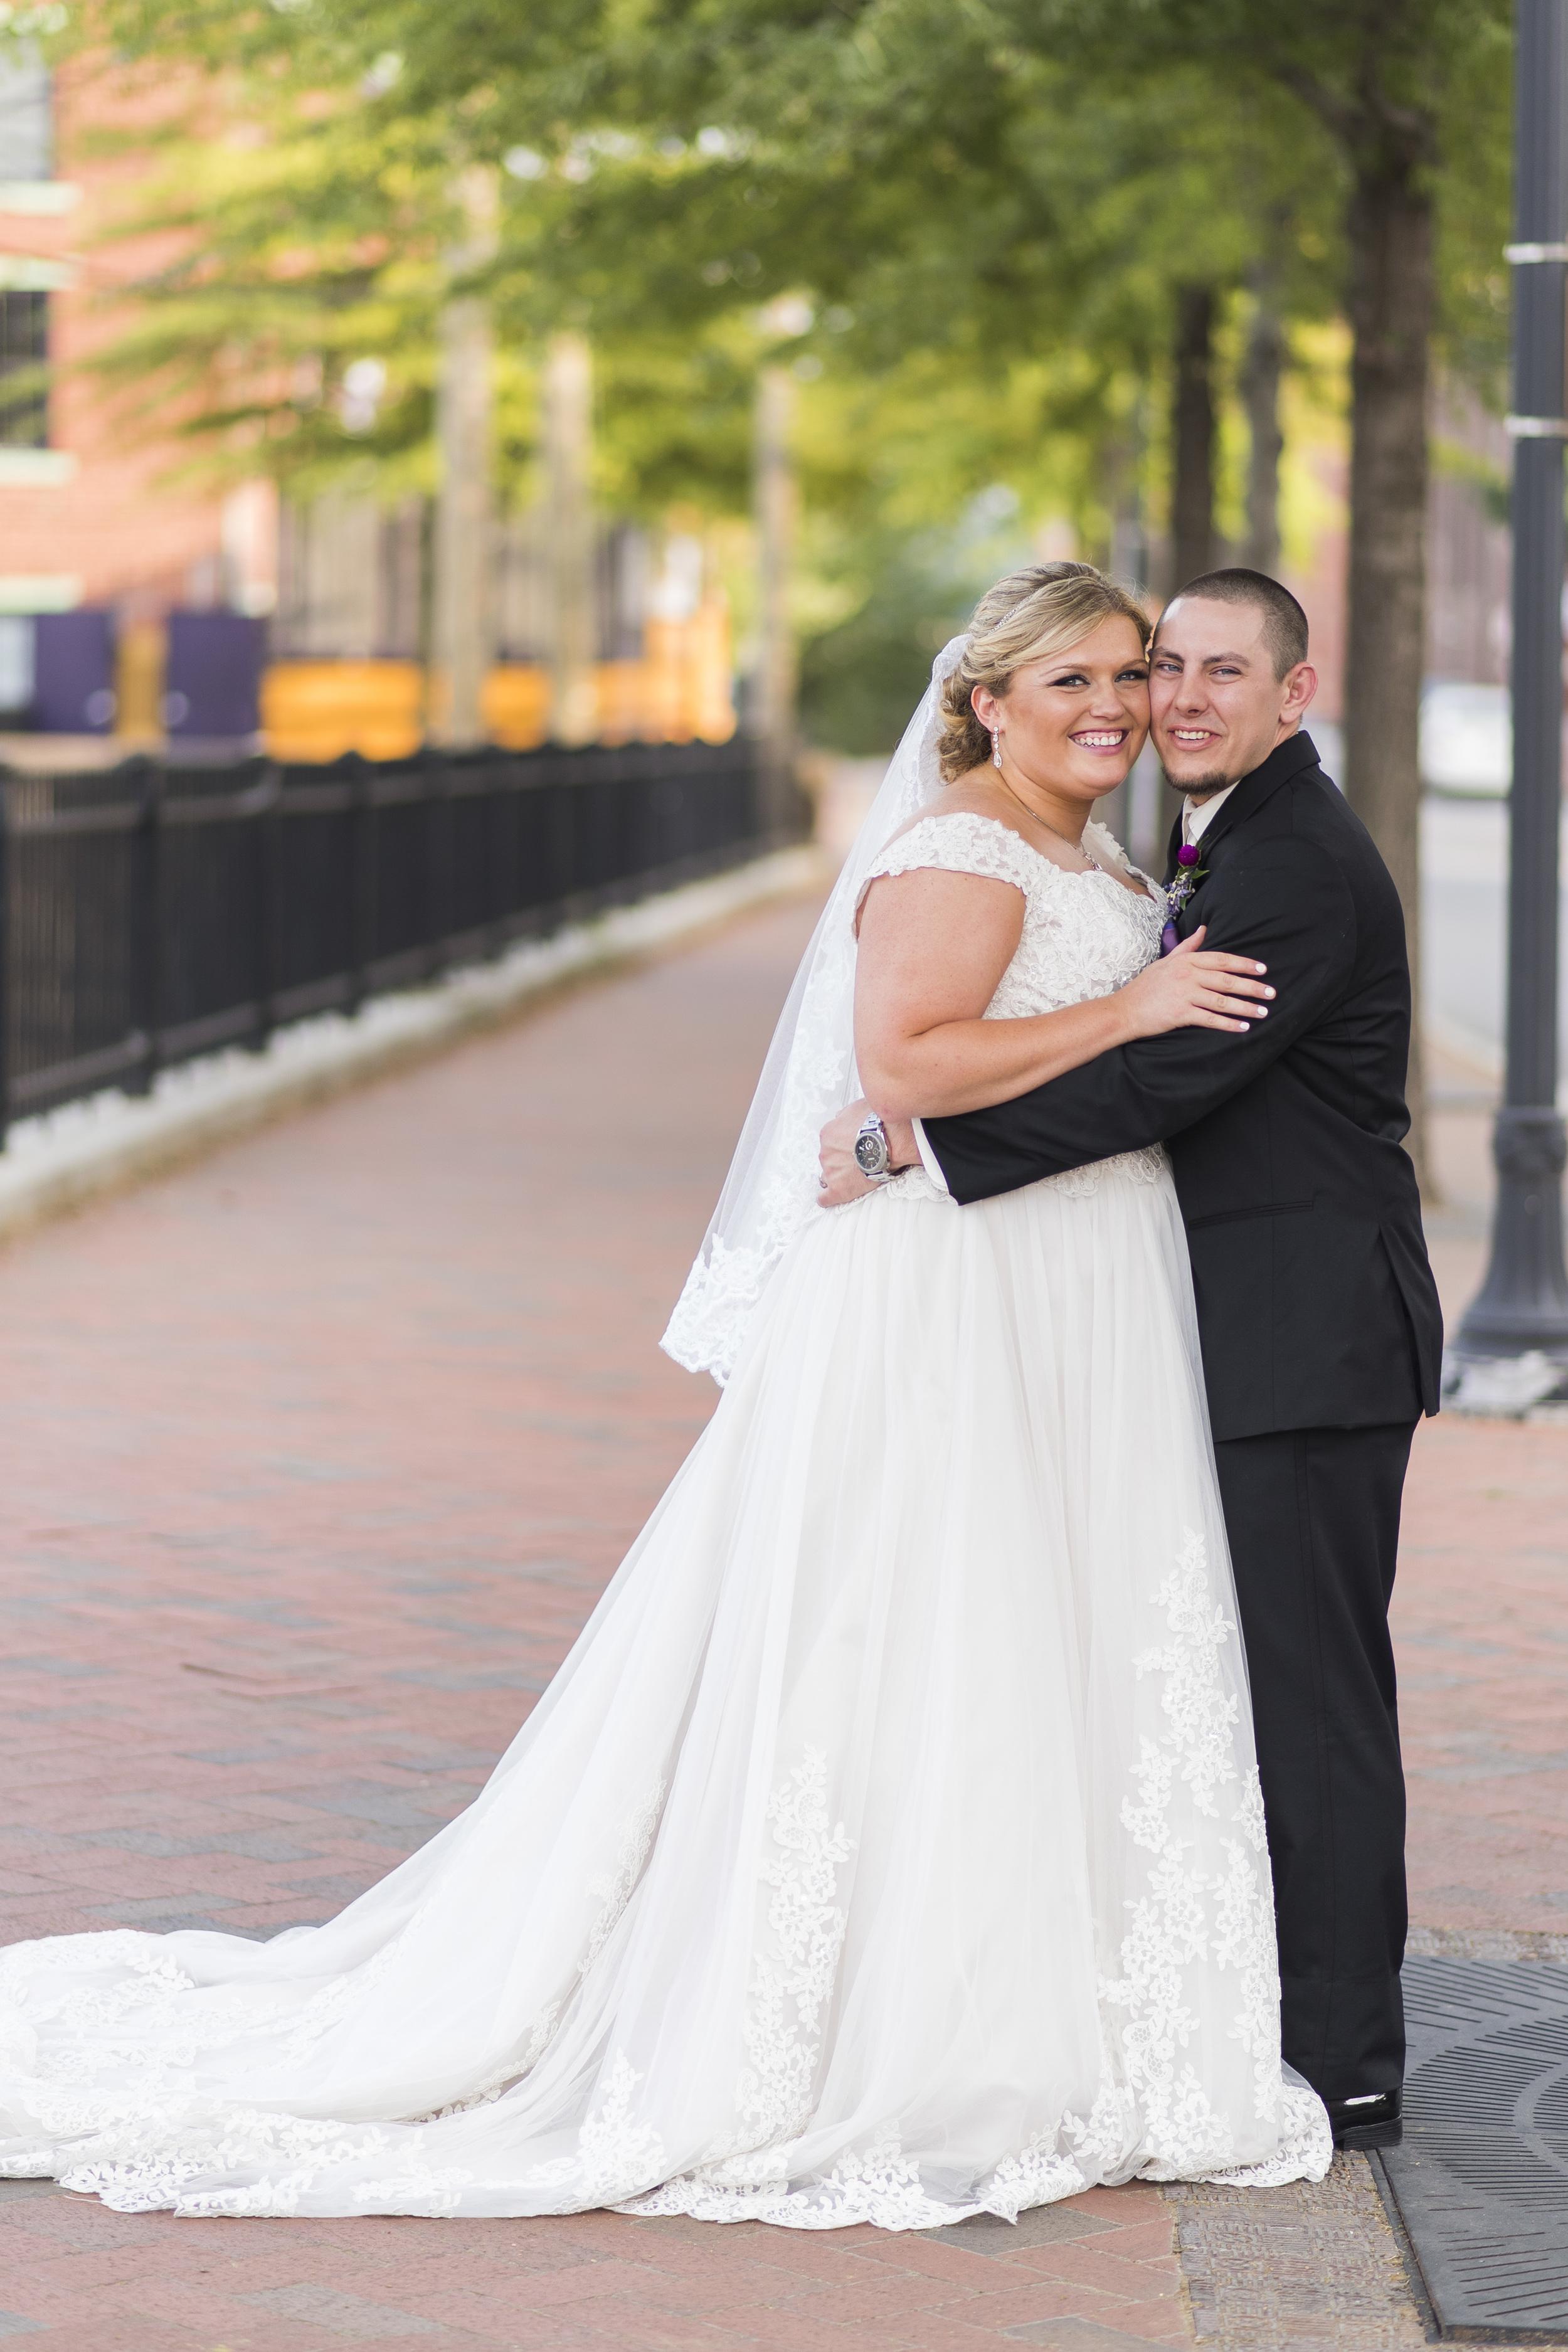 Lynchburg_VA_Wedding_Tresca on 8th_Downtown_Purple_elegant_Photos900.jpg